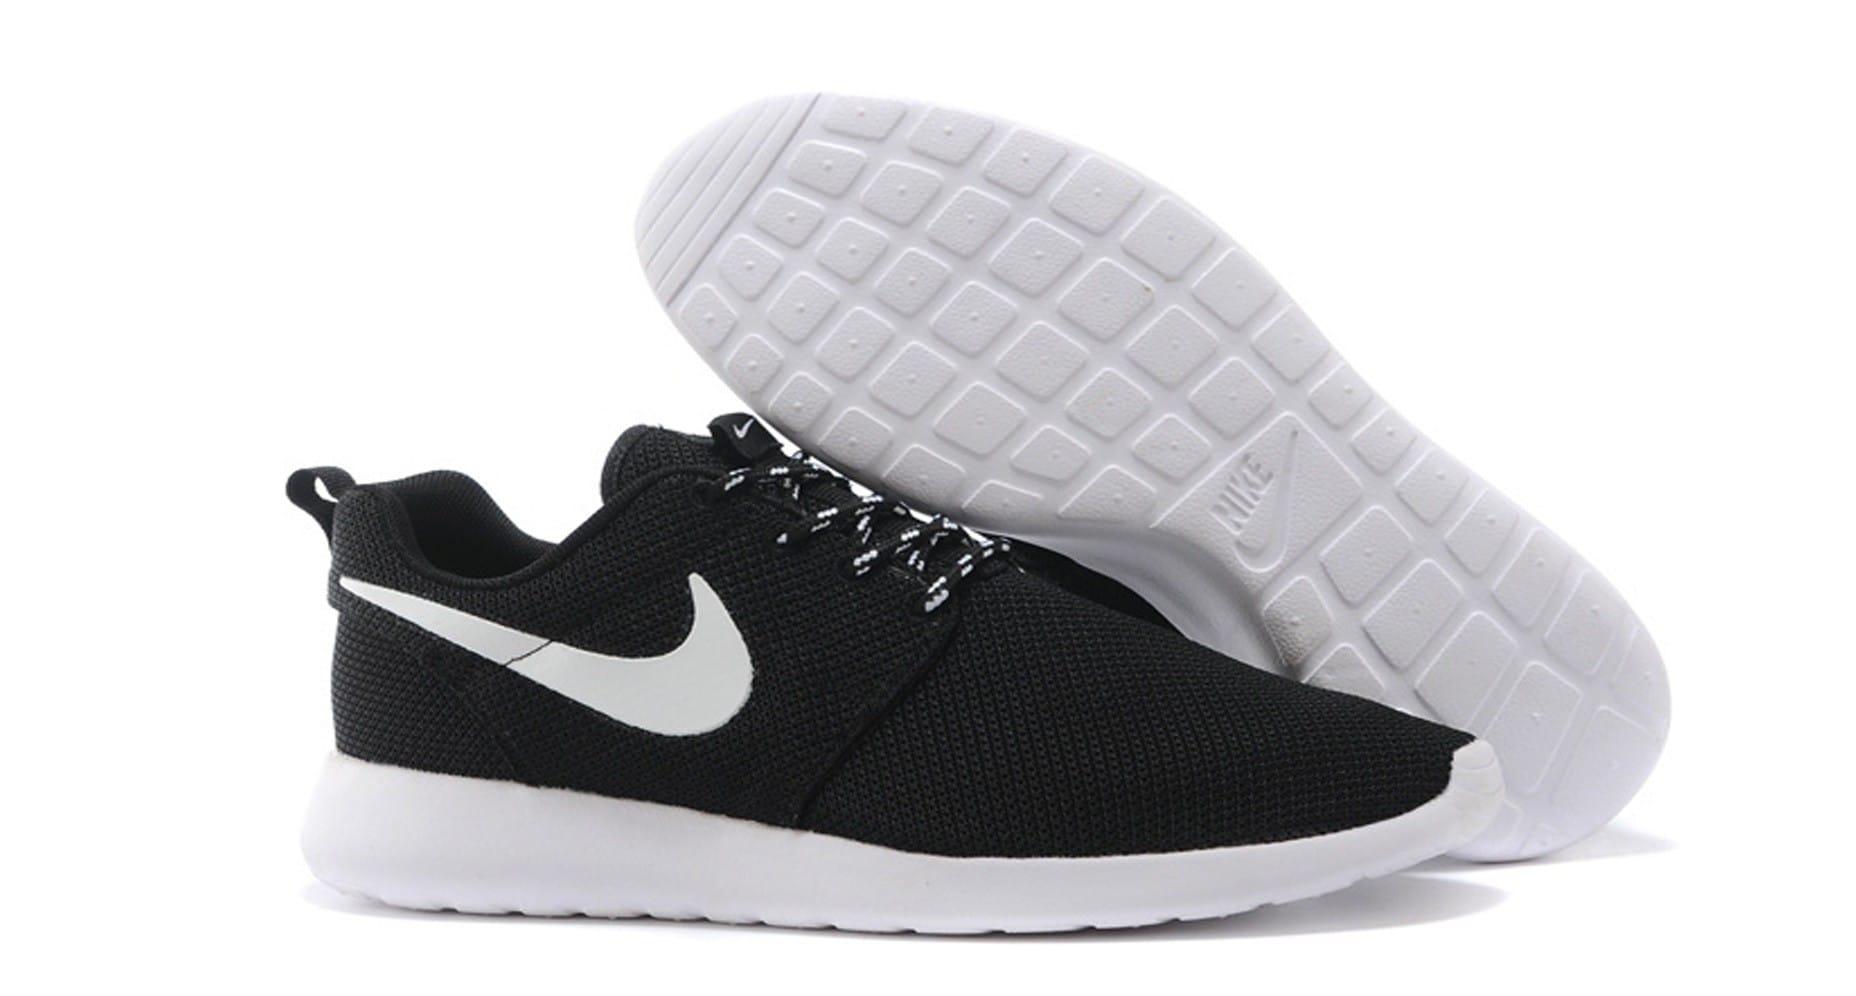 Nike Roshe Run Hombre Rojas